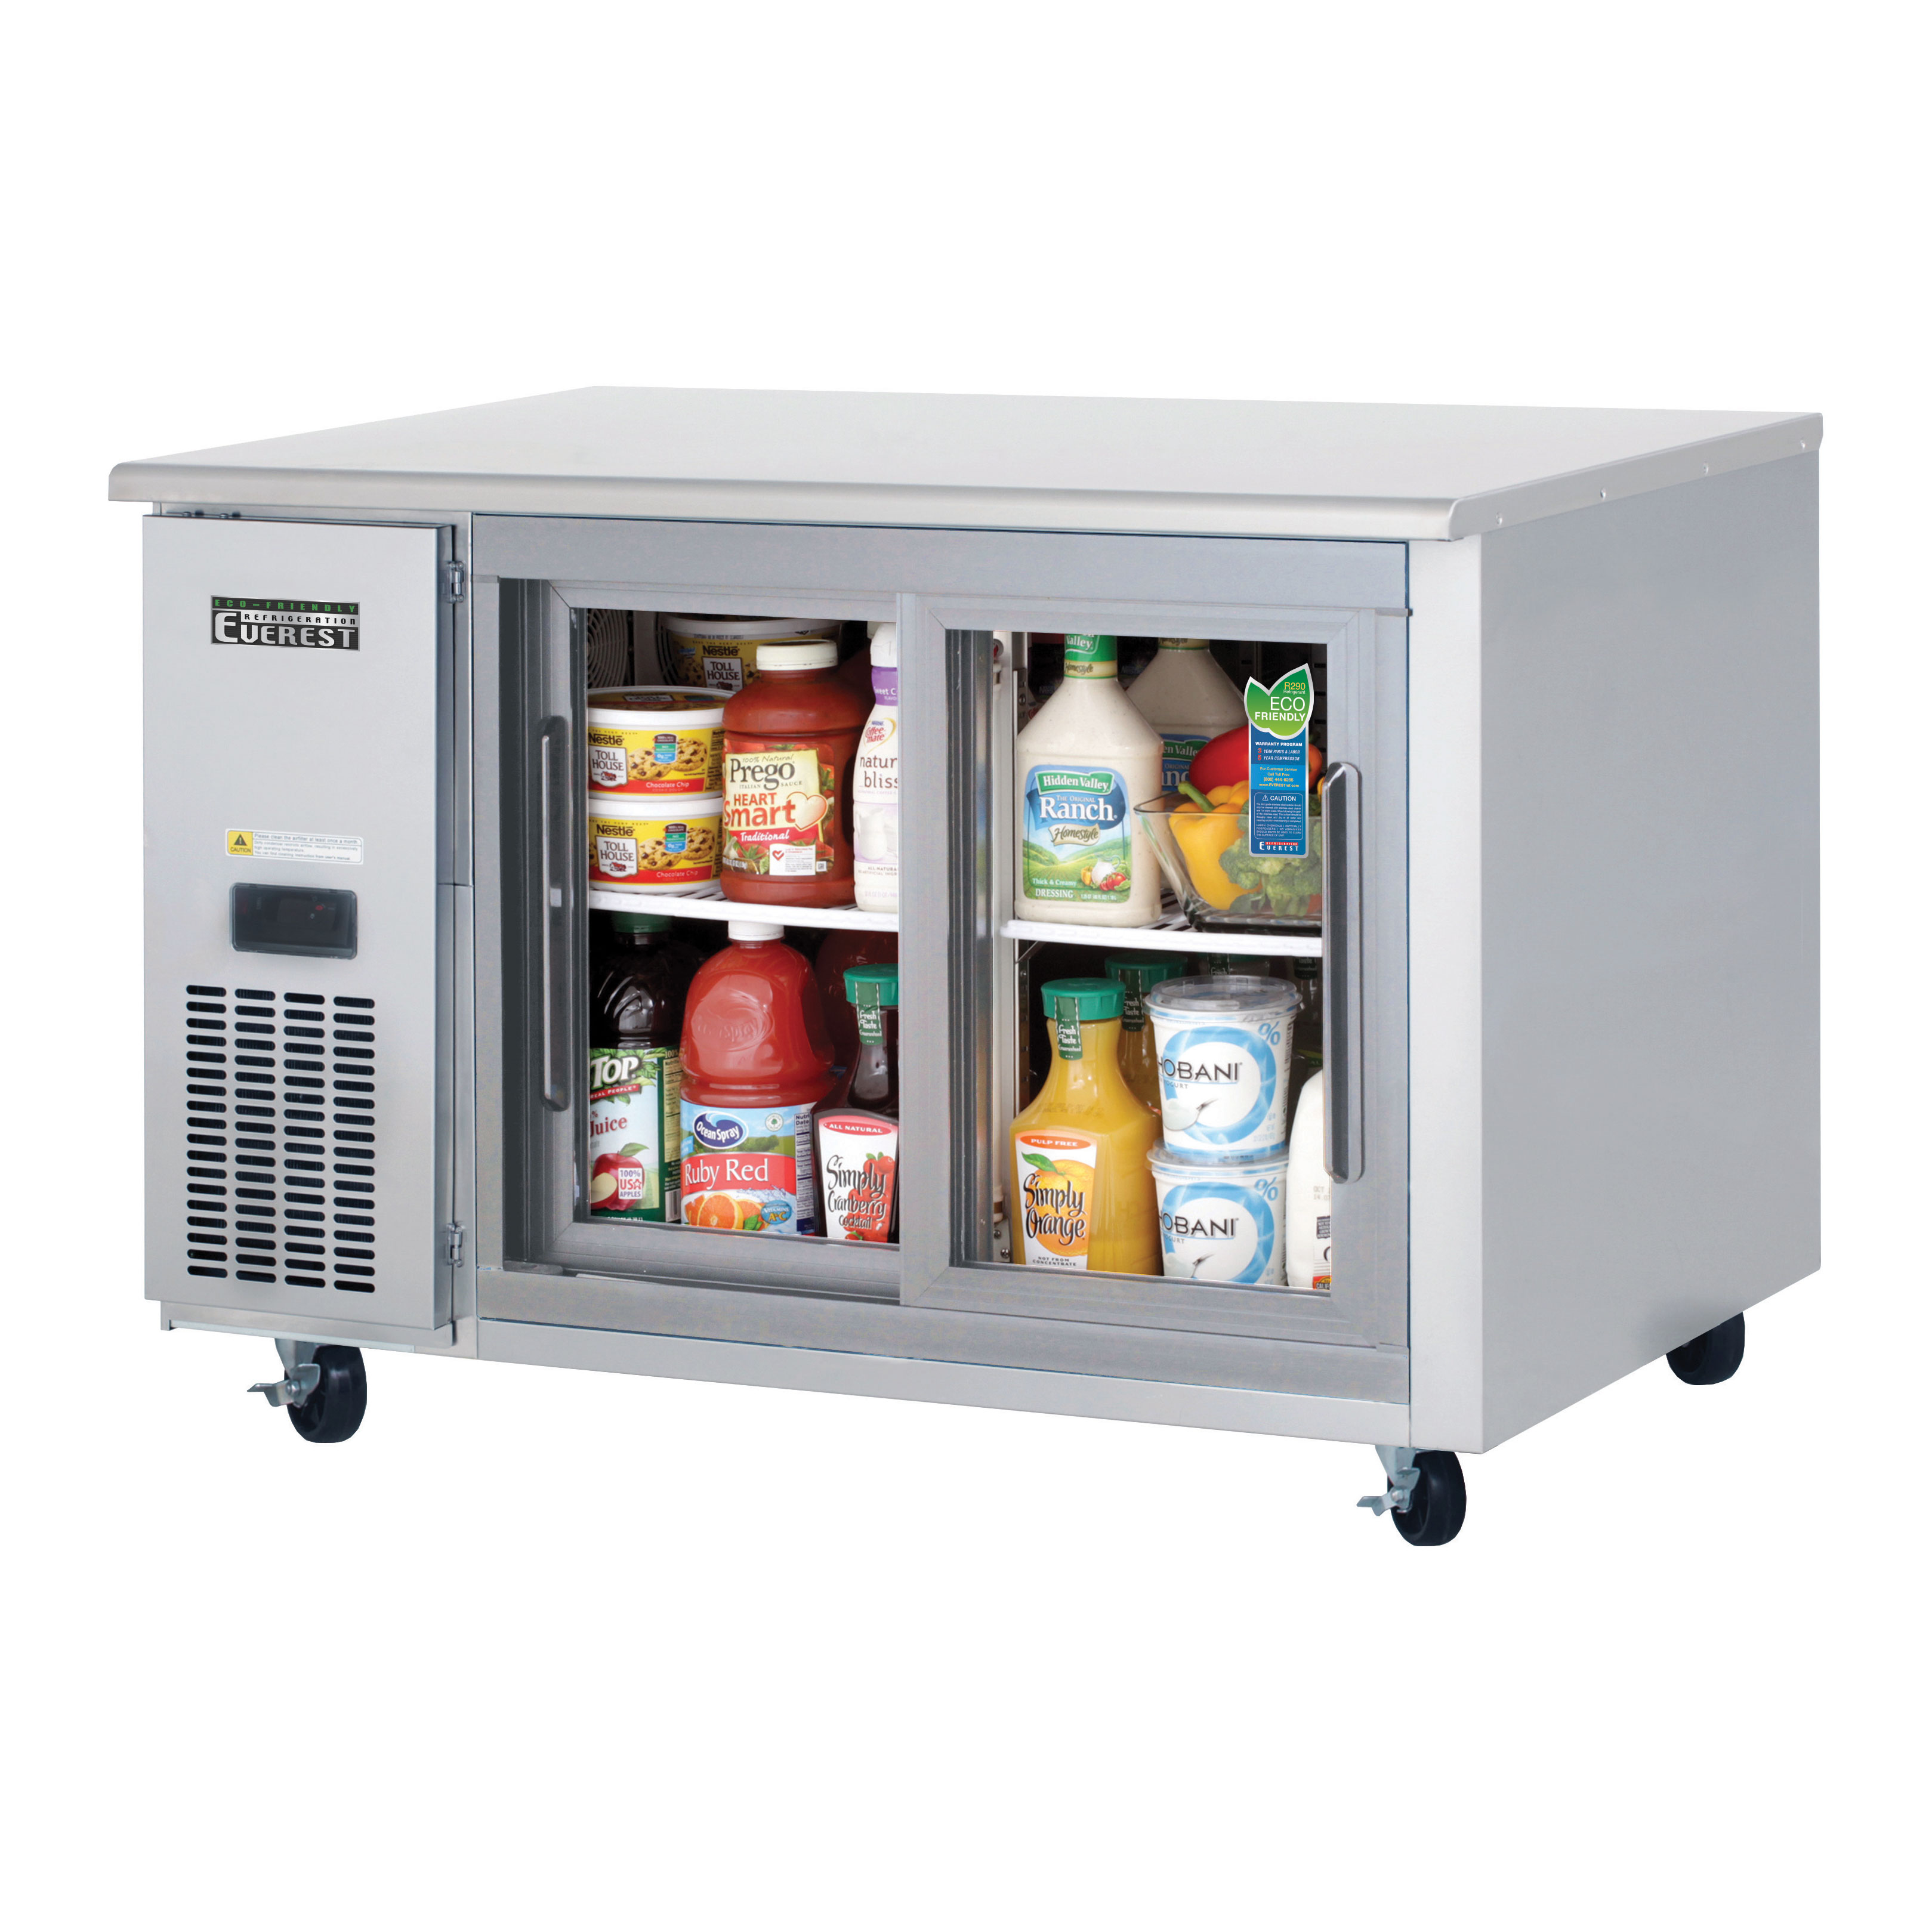 Everest Refrigeration ETGSR2 refrigerator, undercounter, reach-in